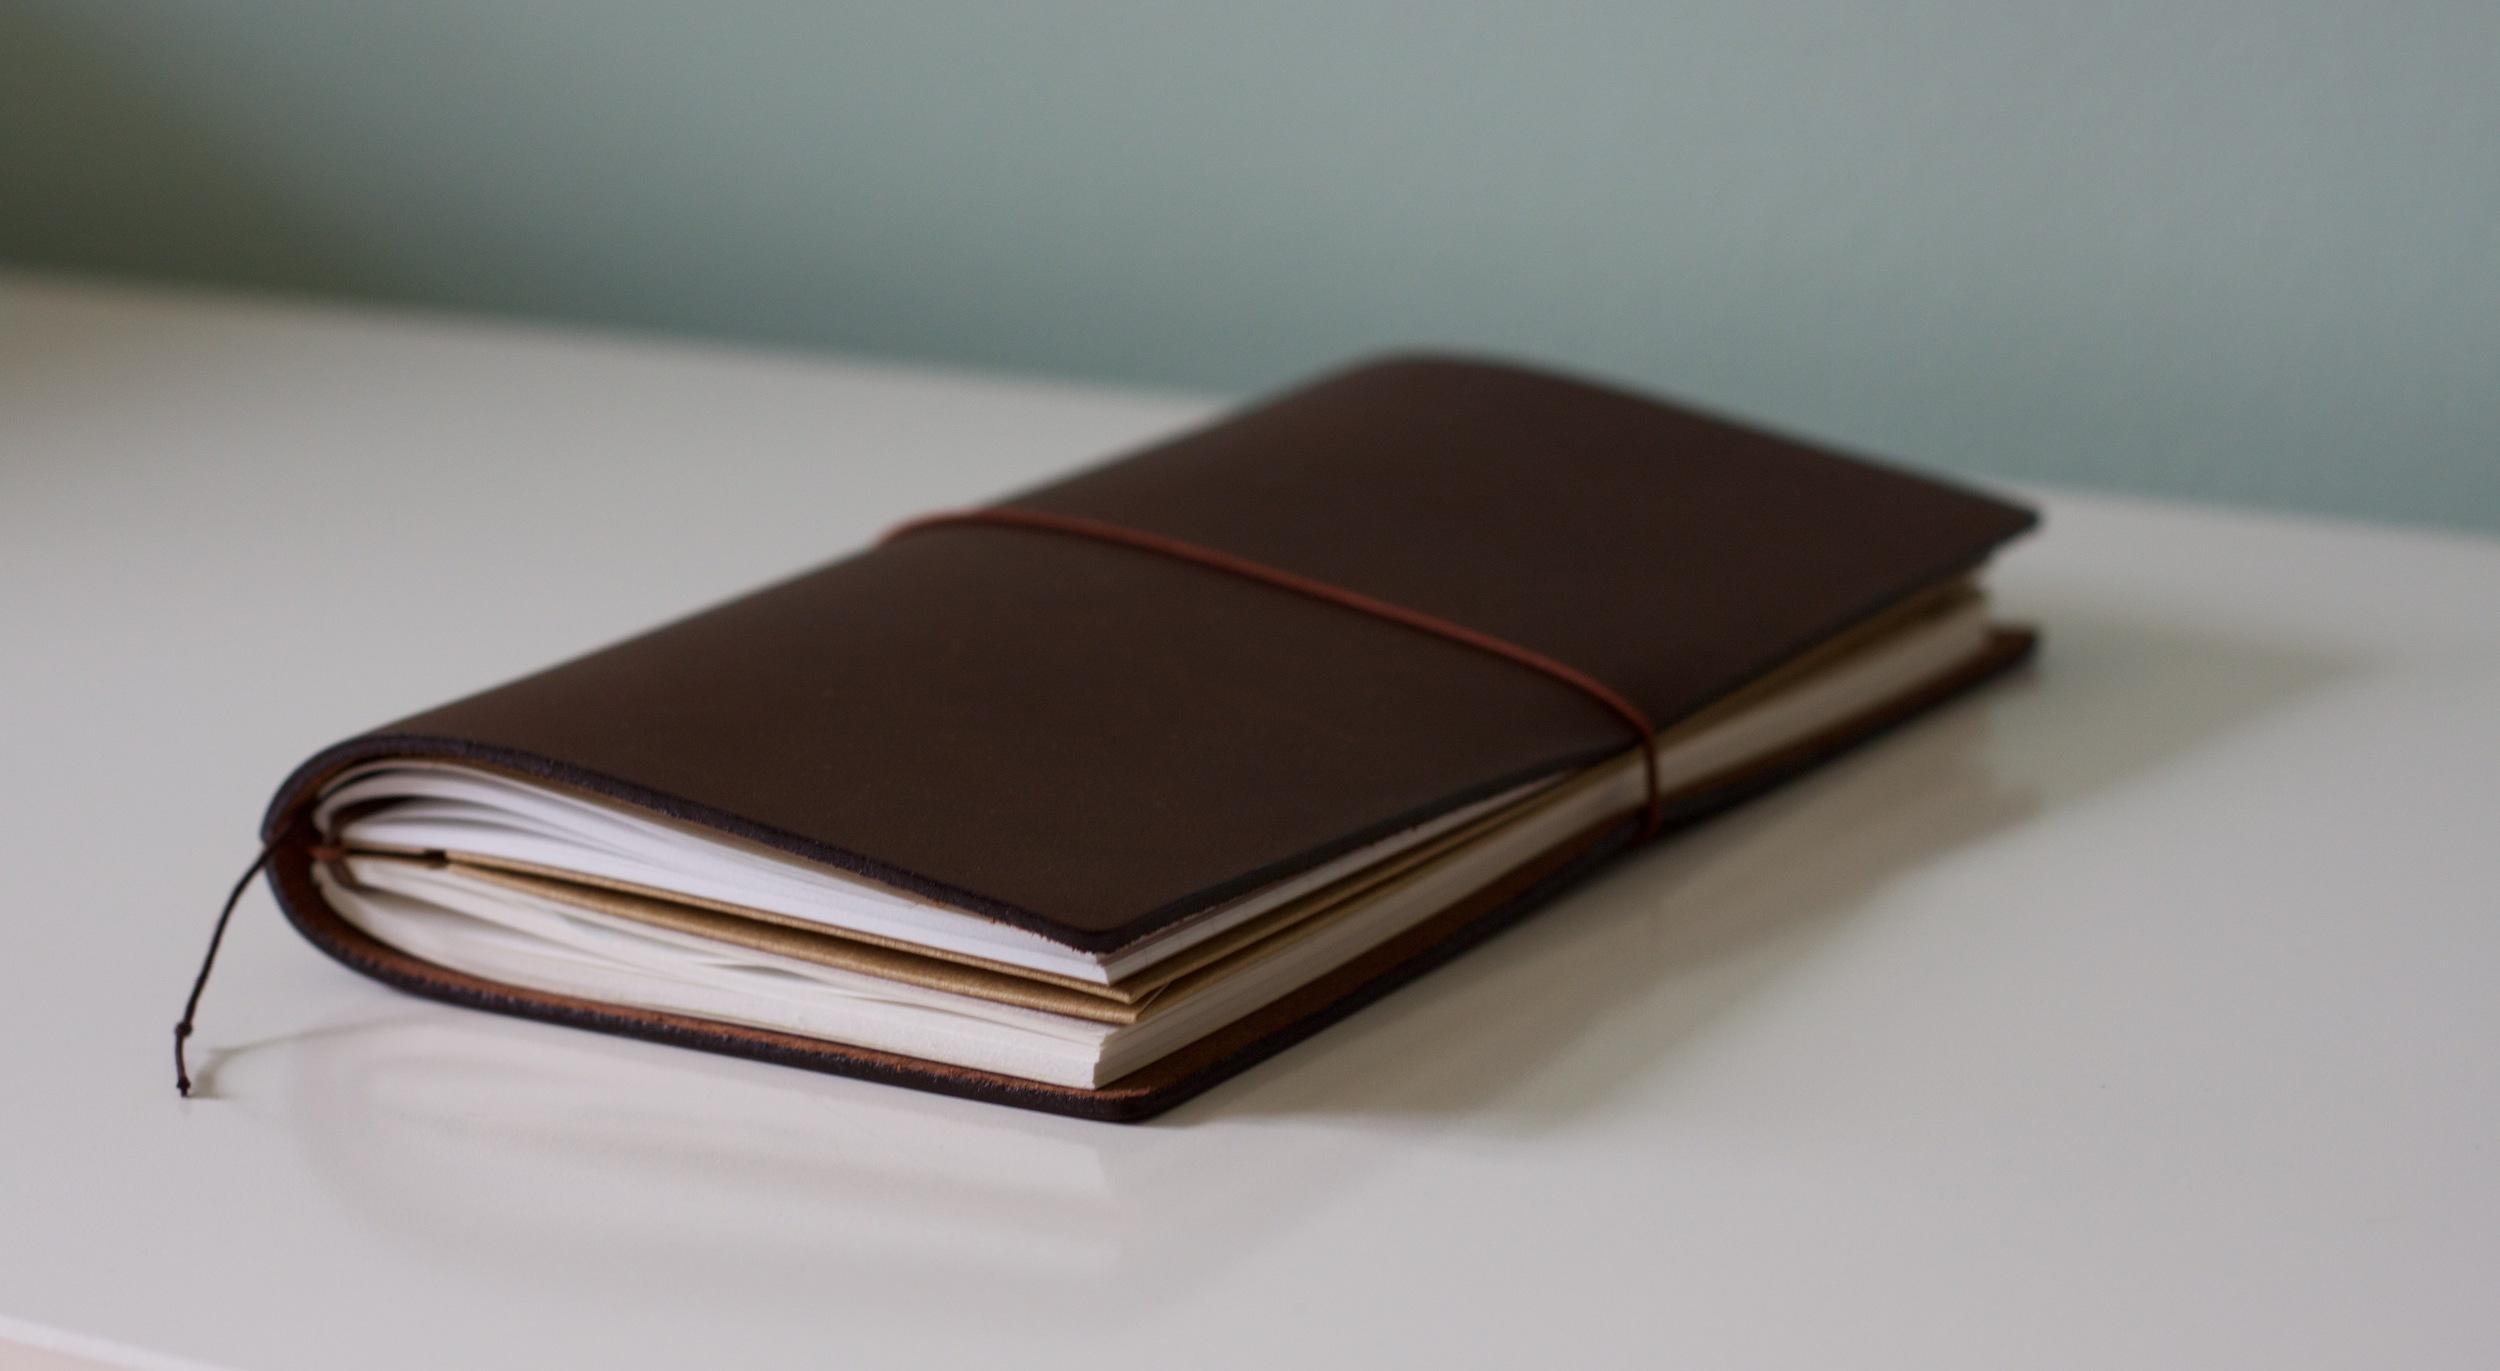 Regular Midori Travelers Notebook, brown leather